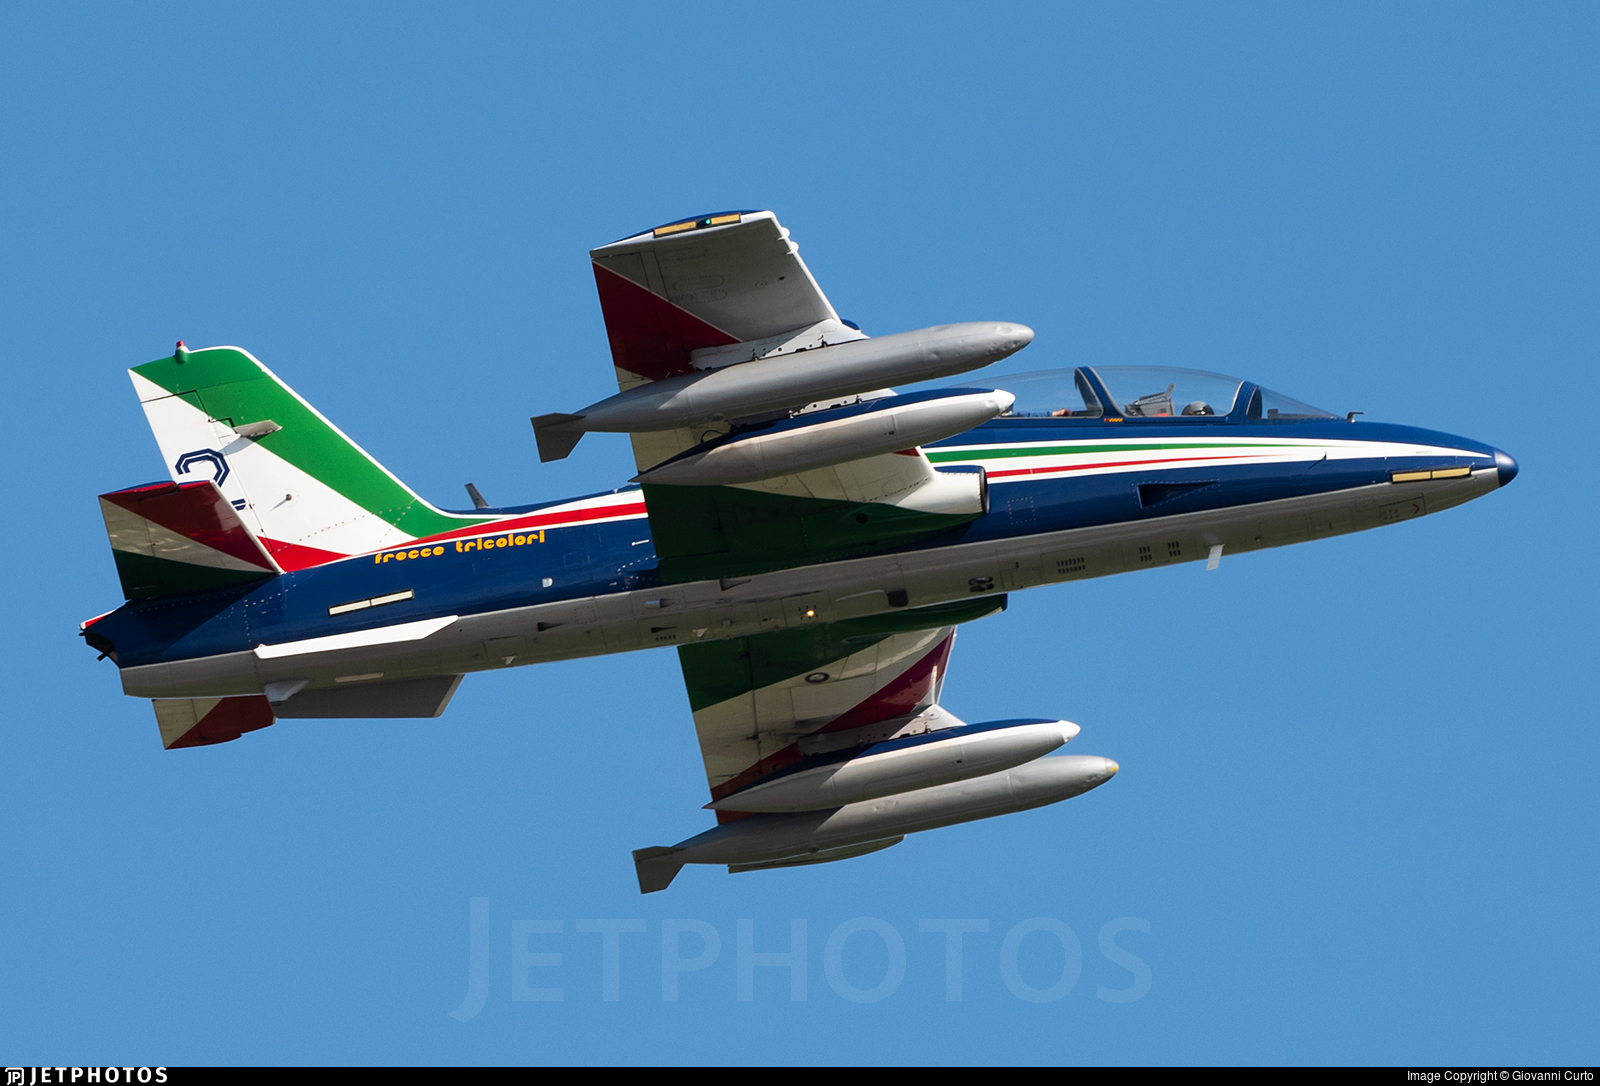 MM54518 - Aermacchi MB-339PAN - Italy - Air Force